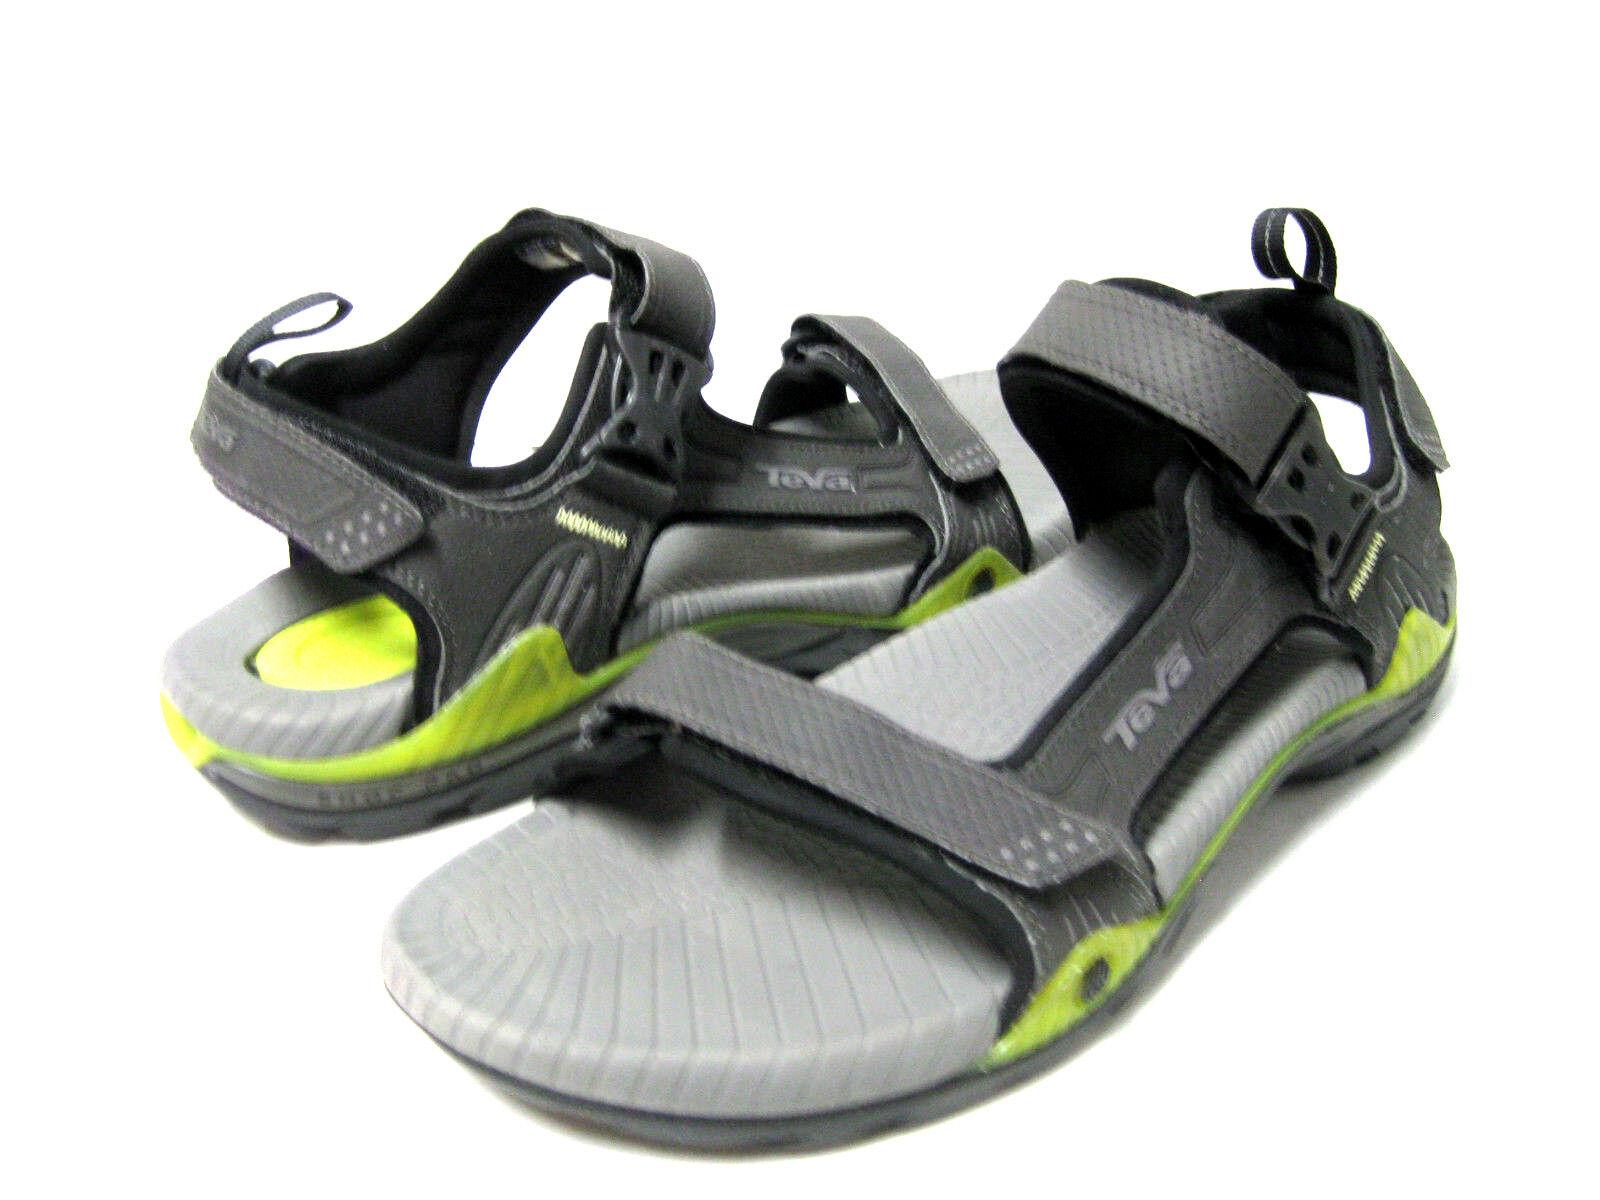 factory authentic bebd8 9a459 Teva Holliway Holliway Holliway Men Sport Sandals Dark Grey US 12  UK11    EU45.5 b4aa50